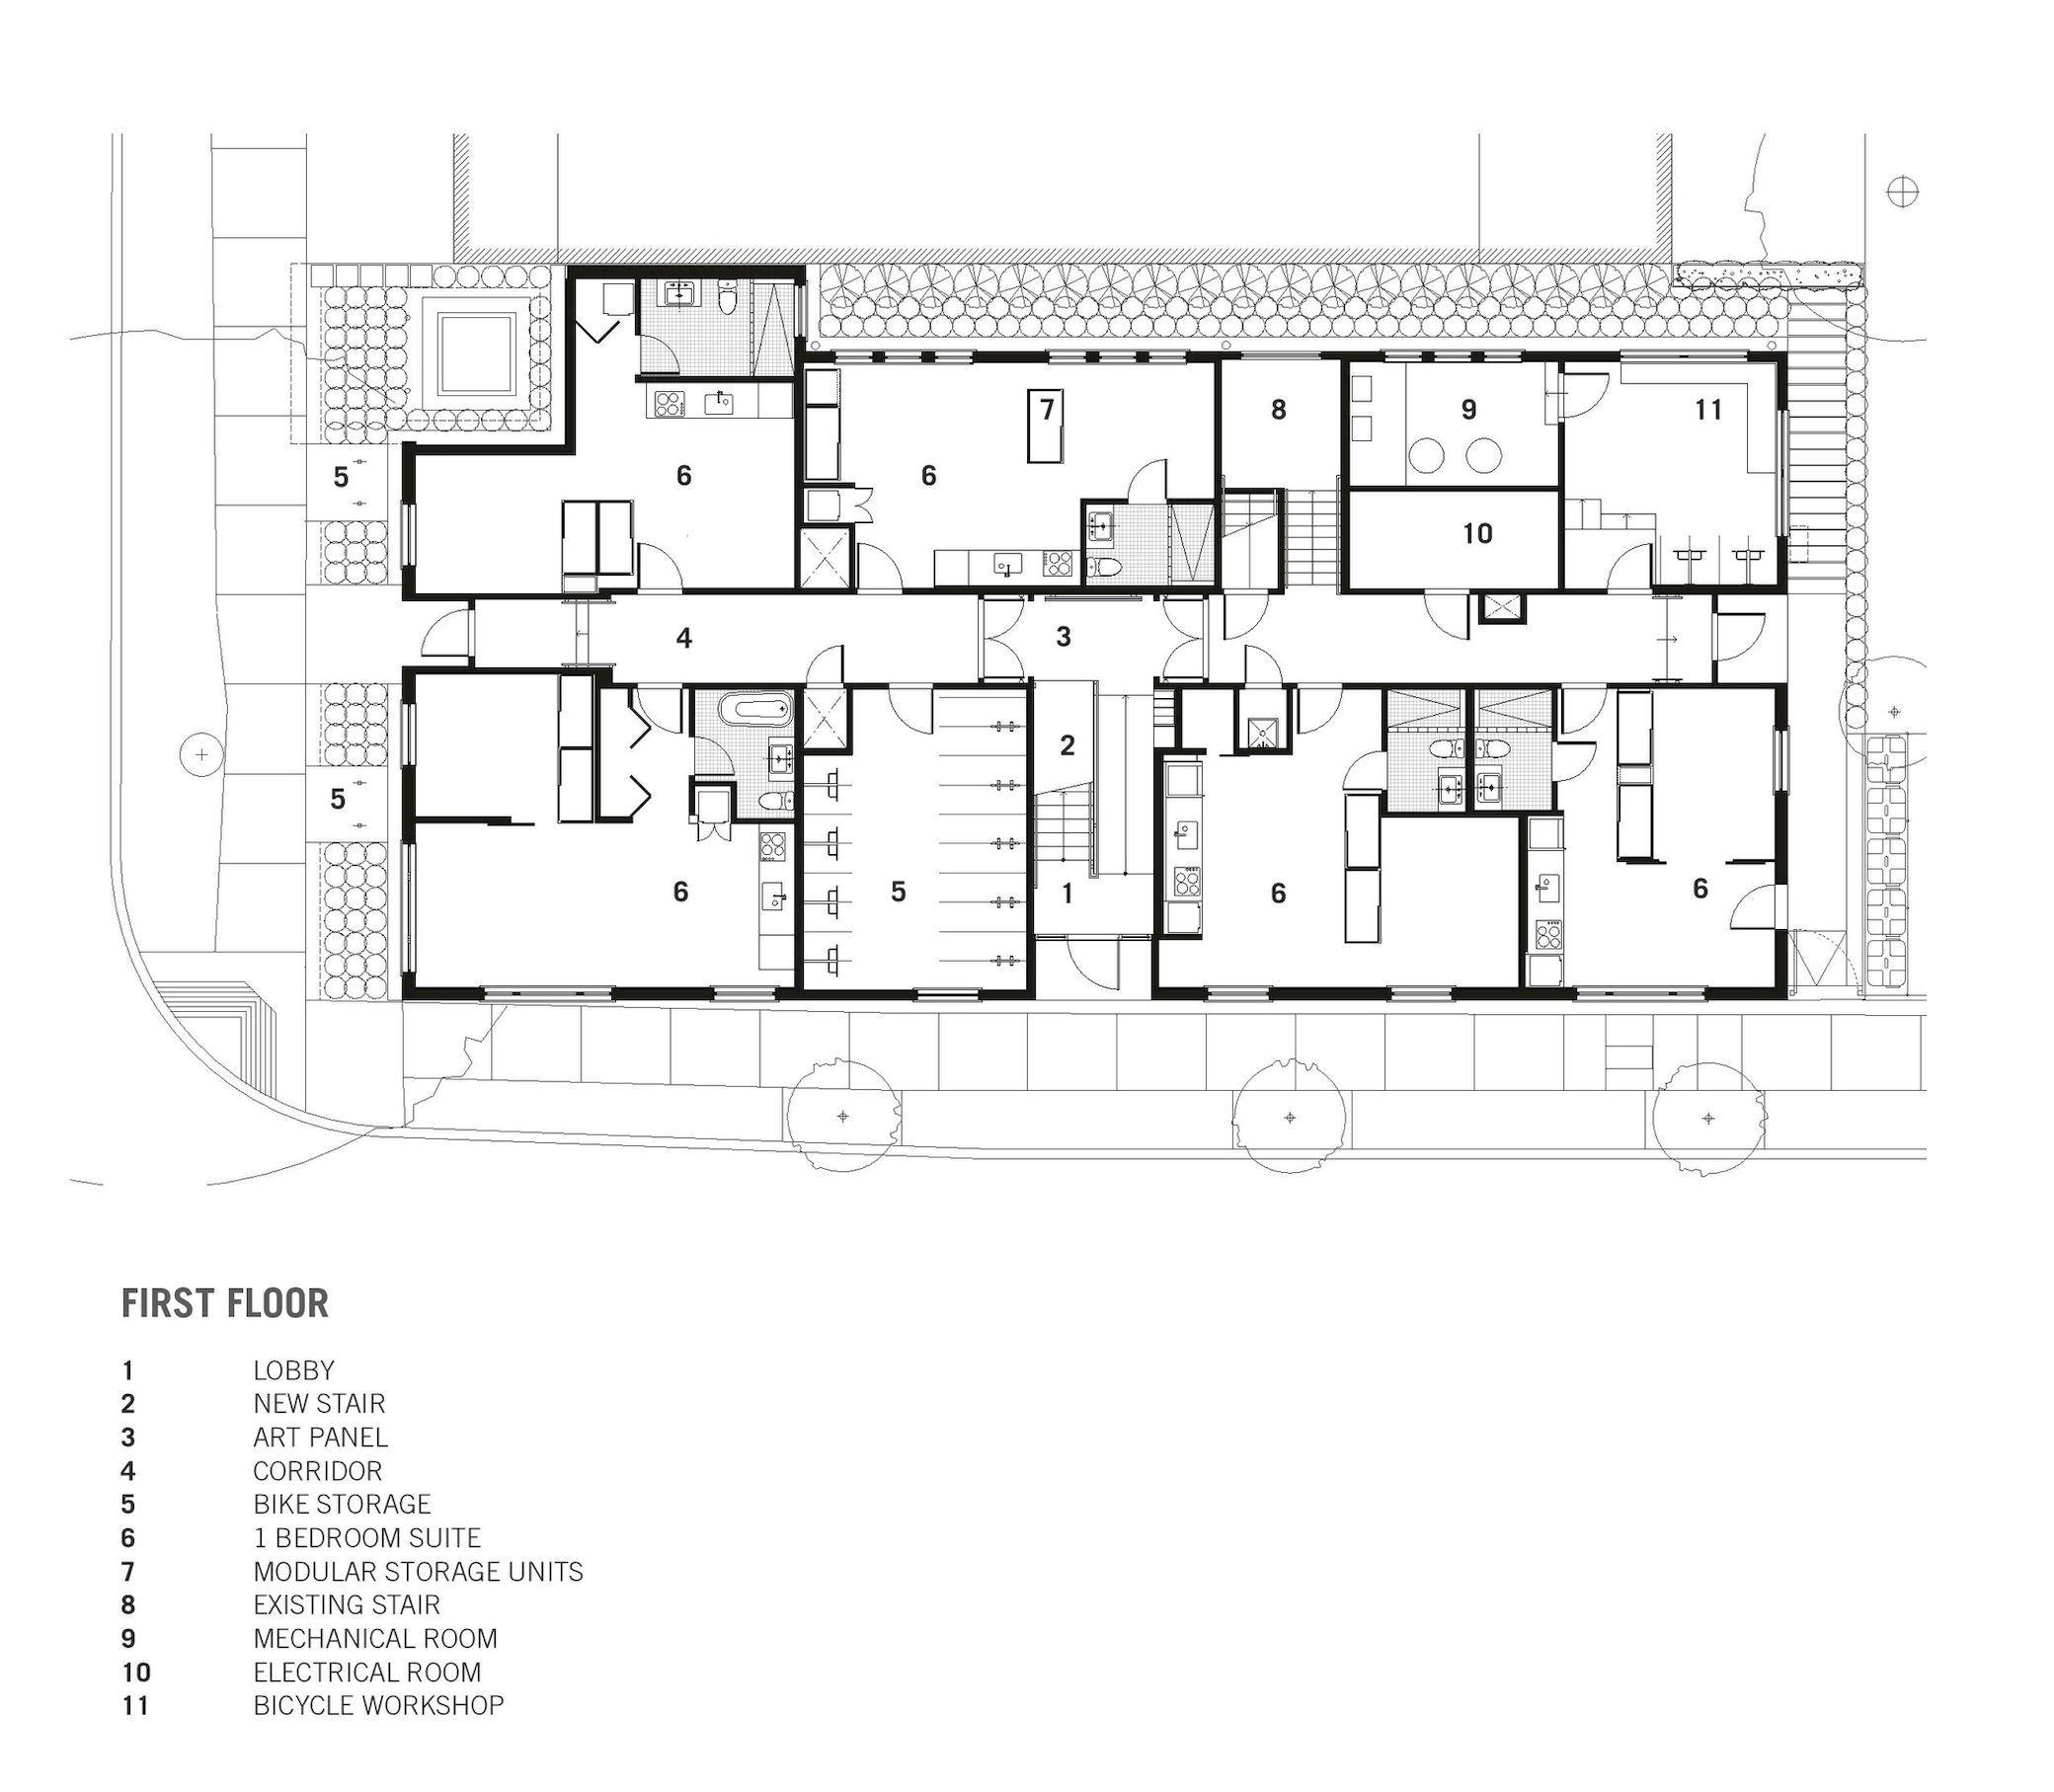 Cambie Apartments Haeccity Studio Architecture Arch2o Com Studios Architecture Architecture Wood Architecture